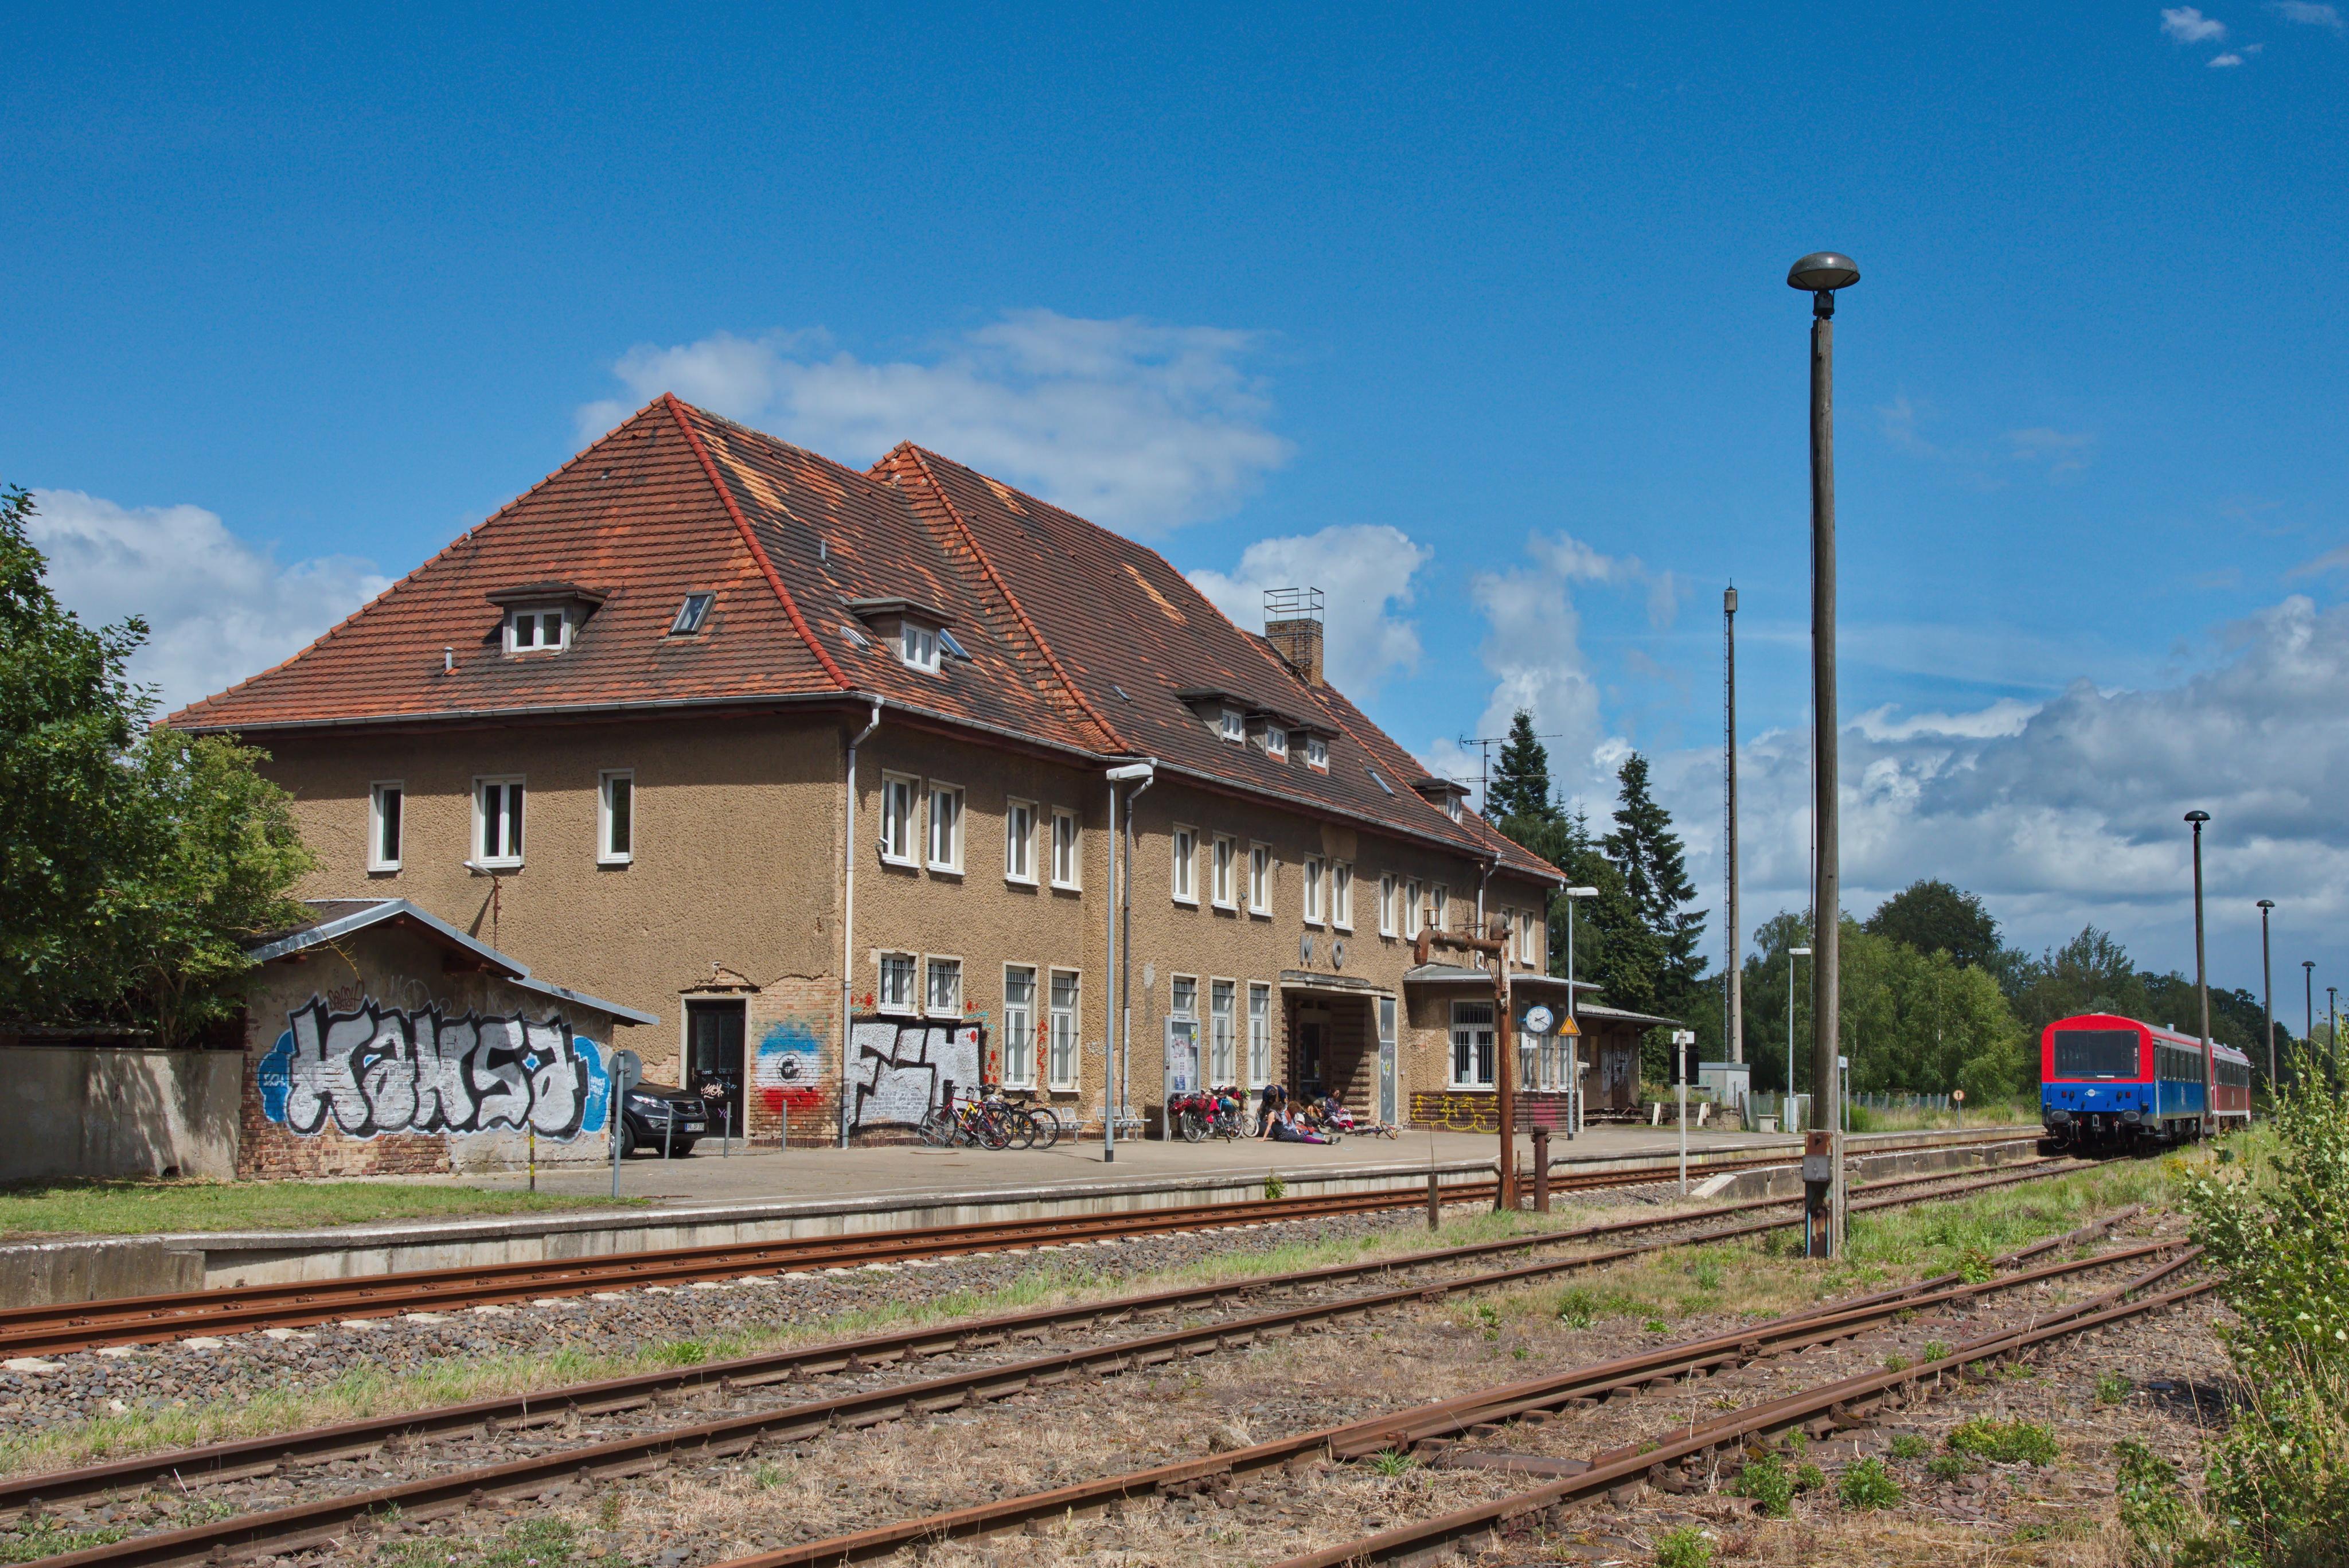 Mirow Railway Station